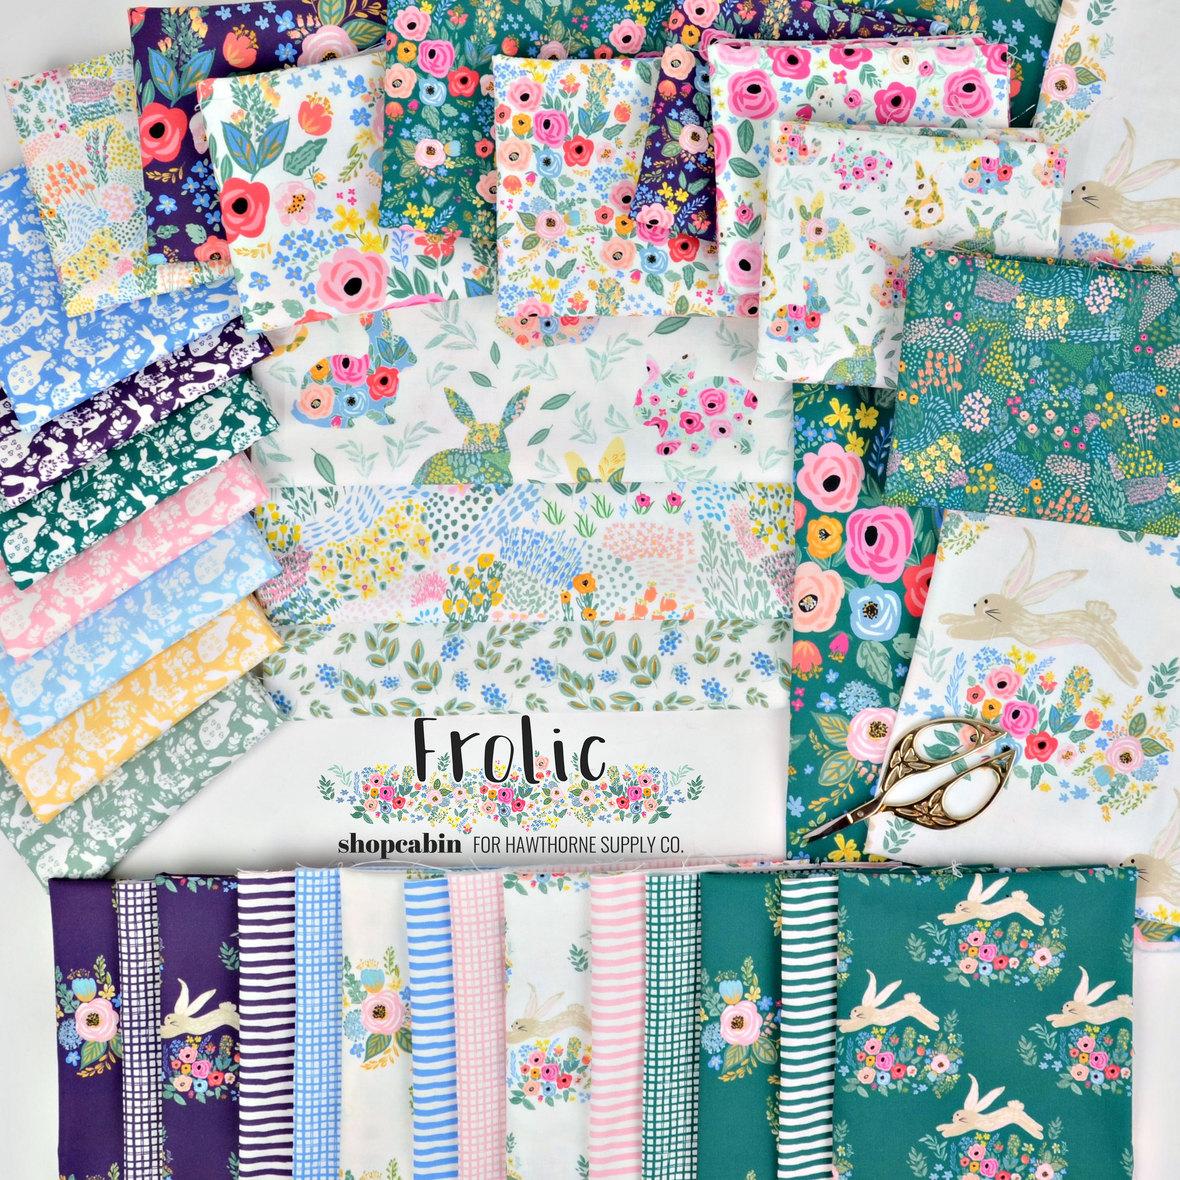 Frolic-Bunny-Fabric-Shopcabin-at-Hawthorne-Supply-Co